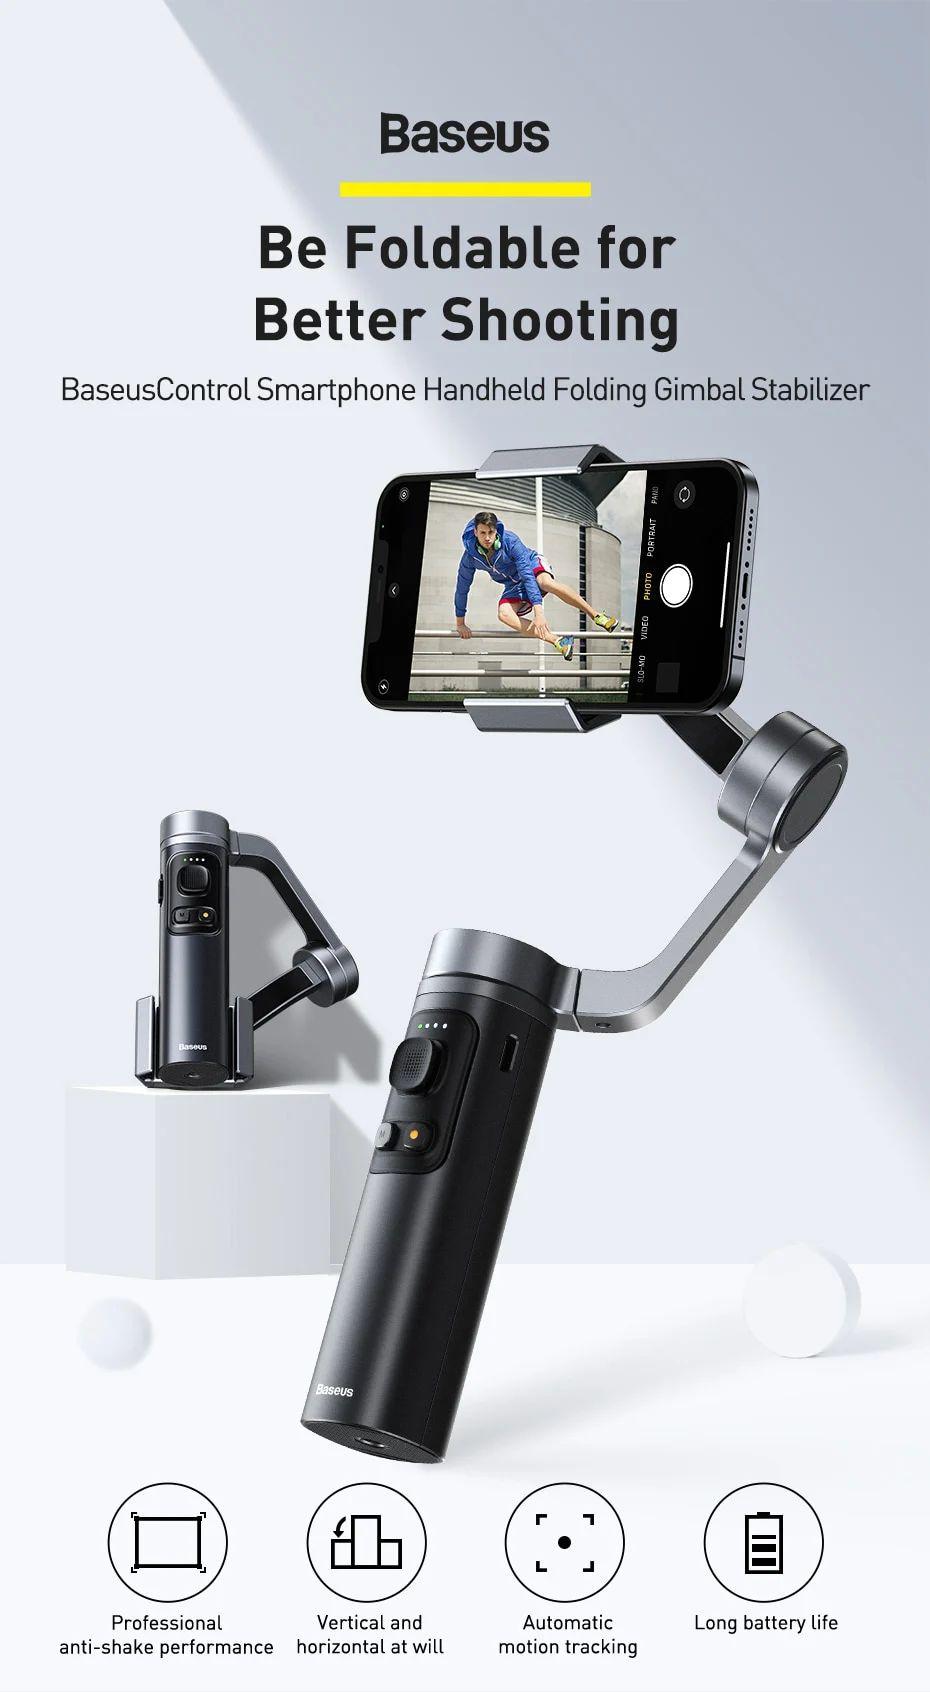 Baseus Control Smartphone Handheld Folding Gimbal Stabilizer (6)